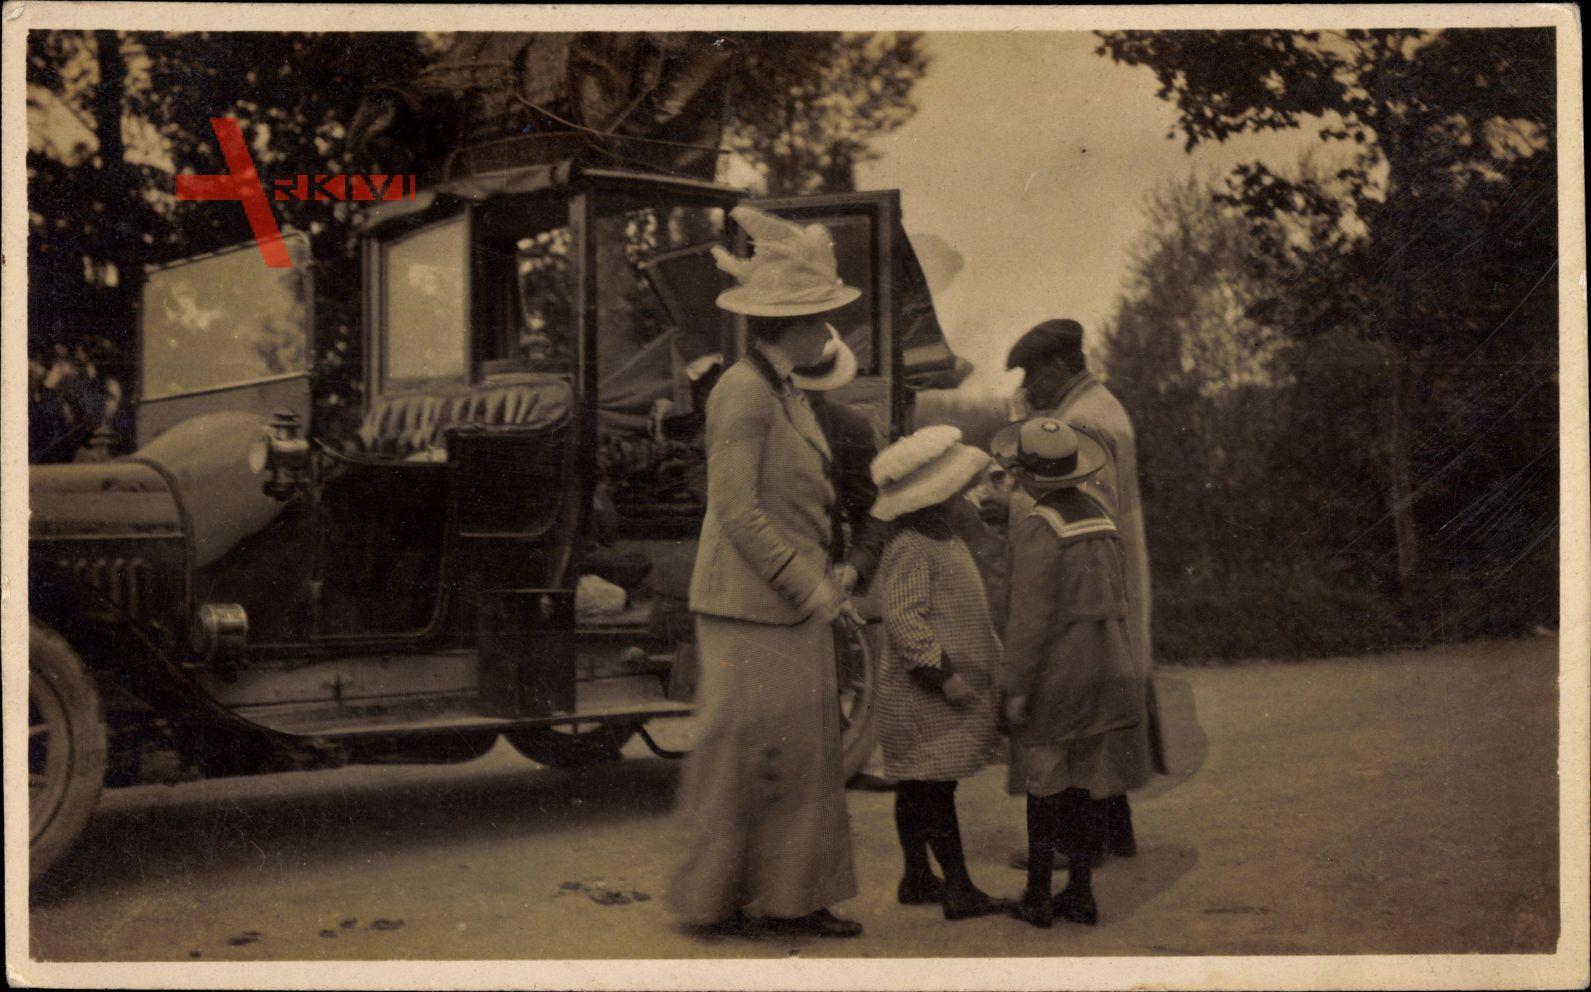 Frankreich, Automobil, Familienausflug, Kinder